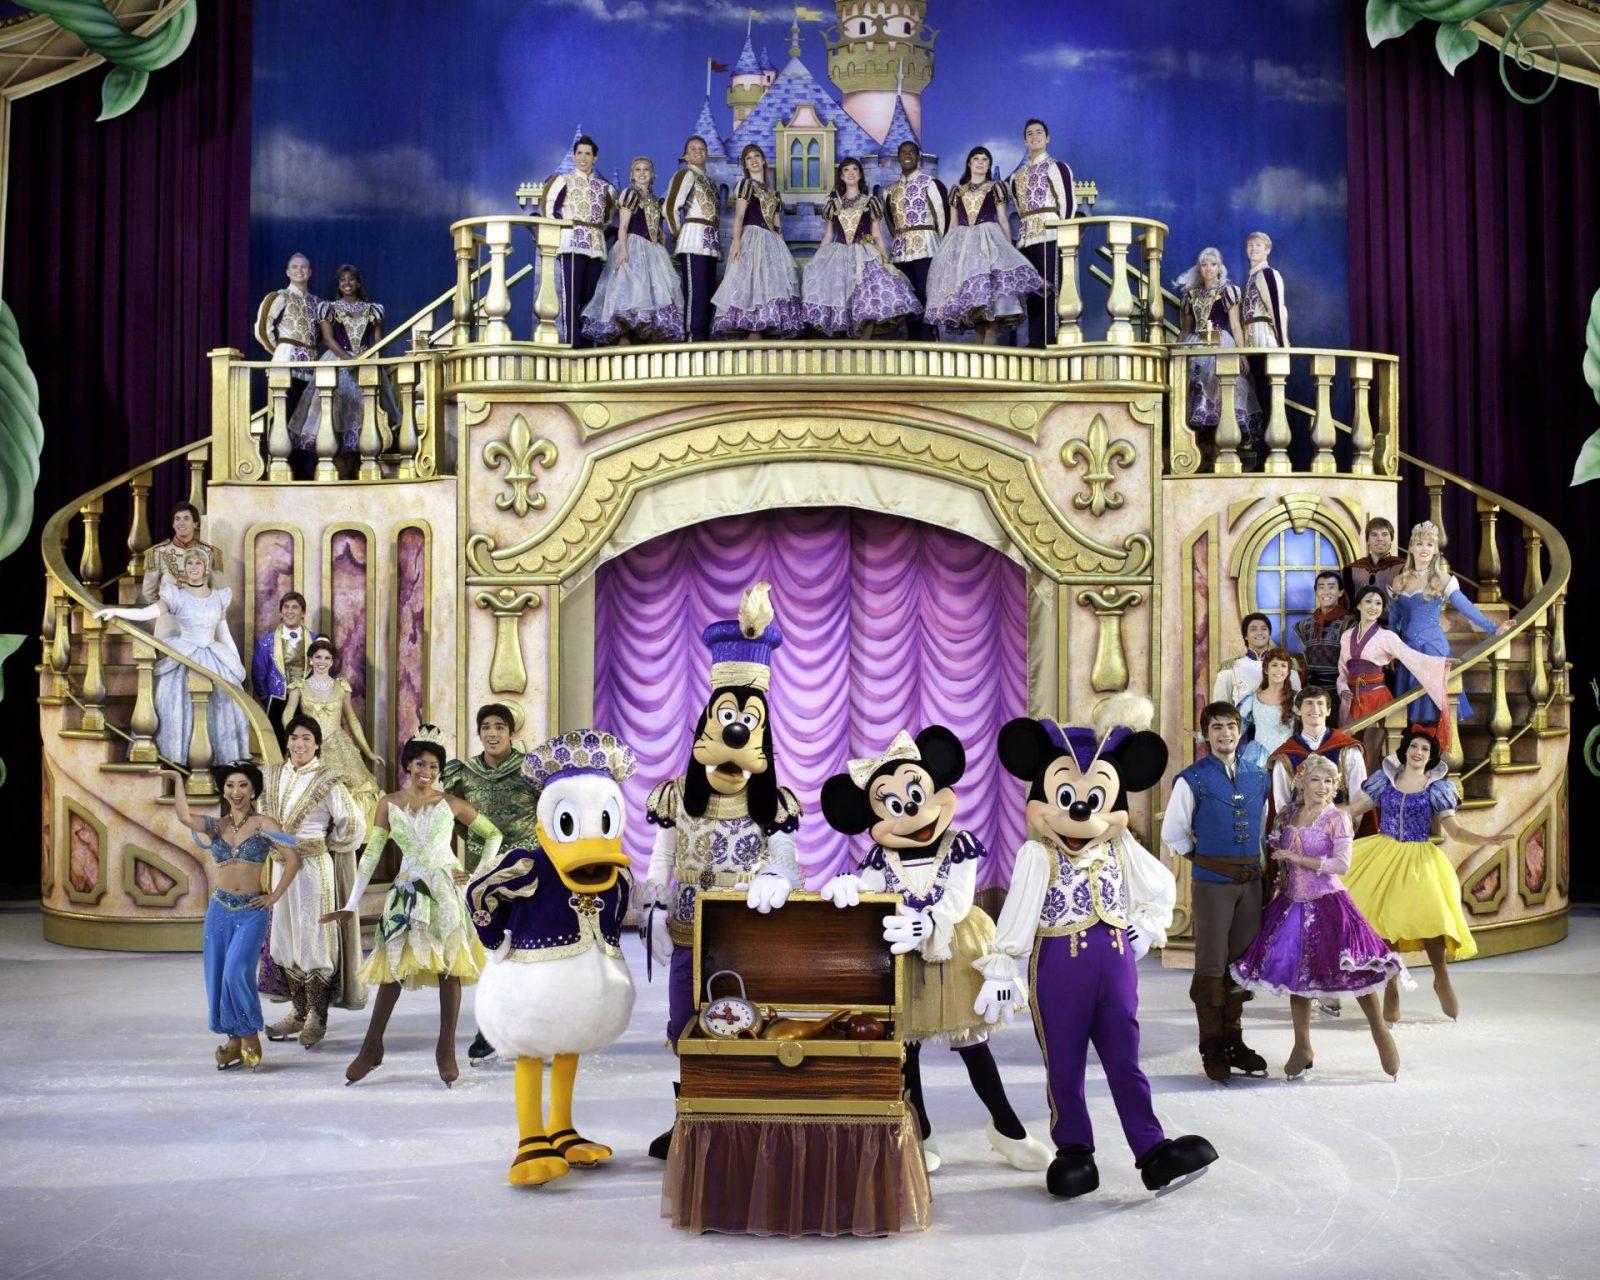 Introducing The Wonderful World Of Disney On Ice…